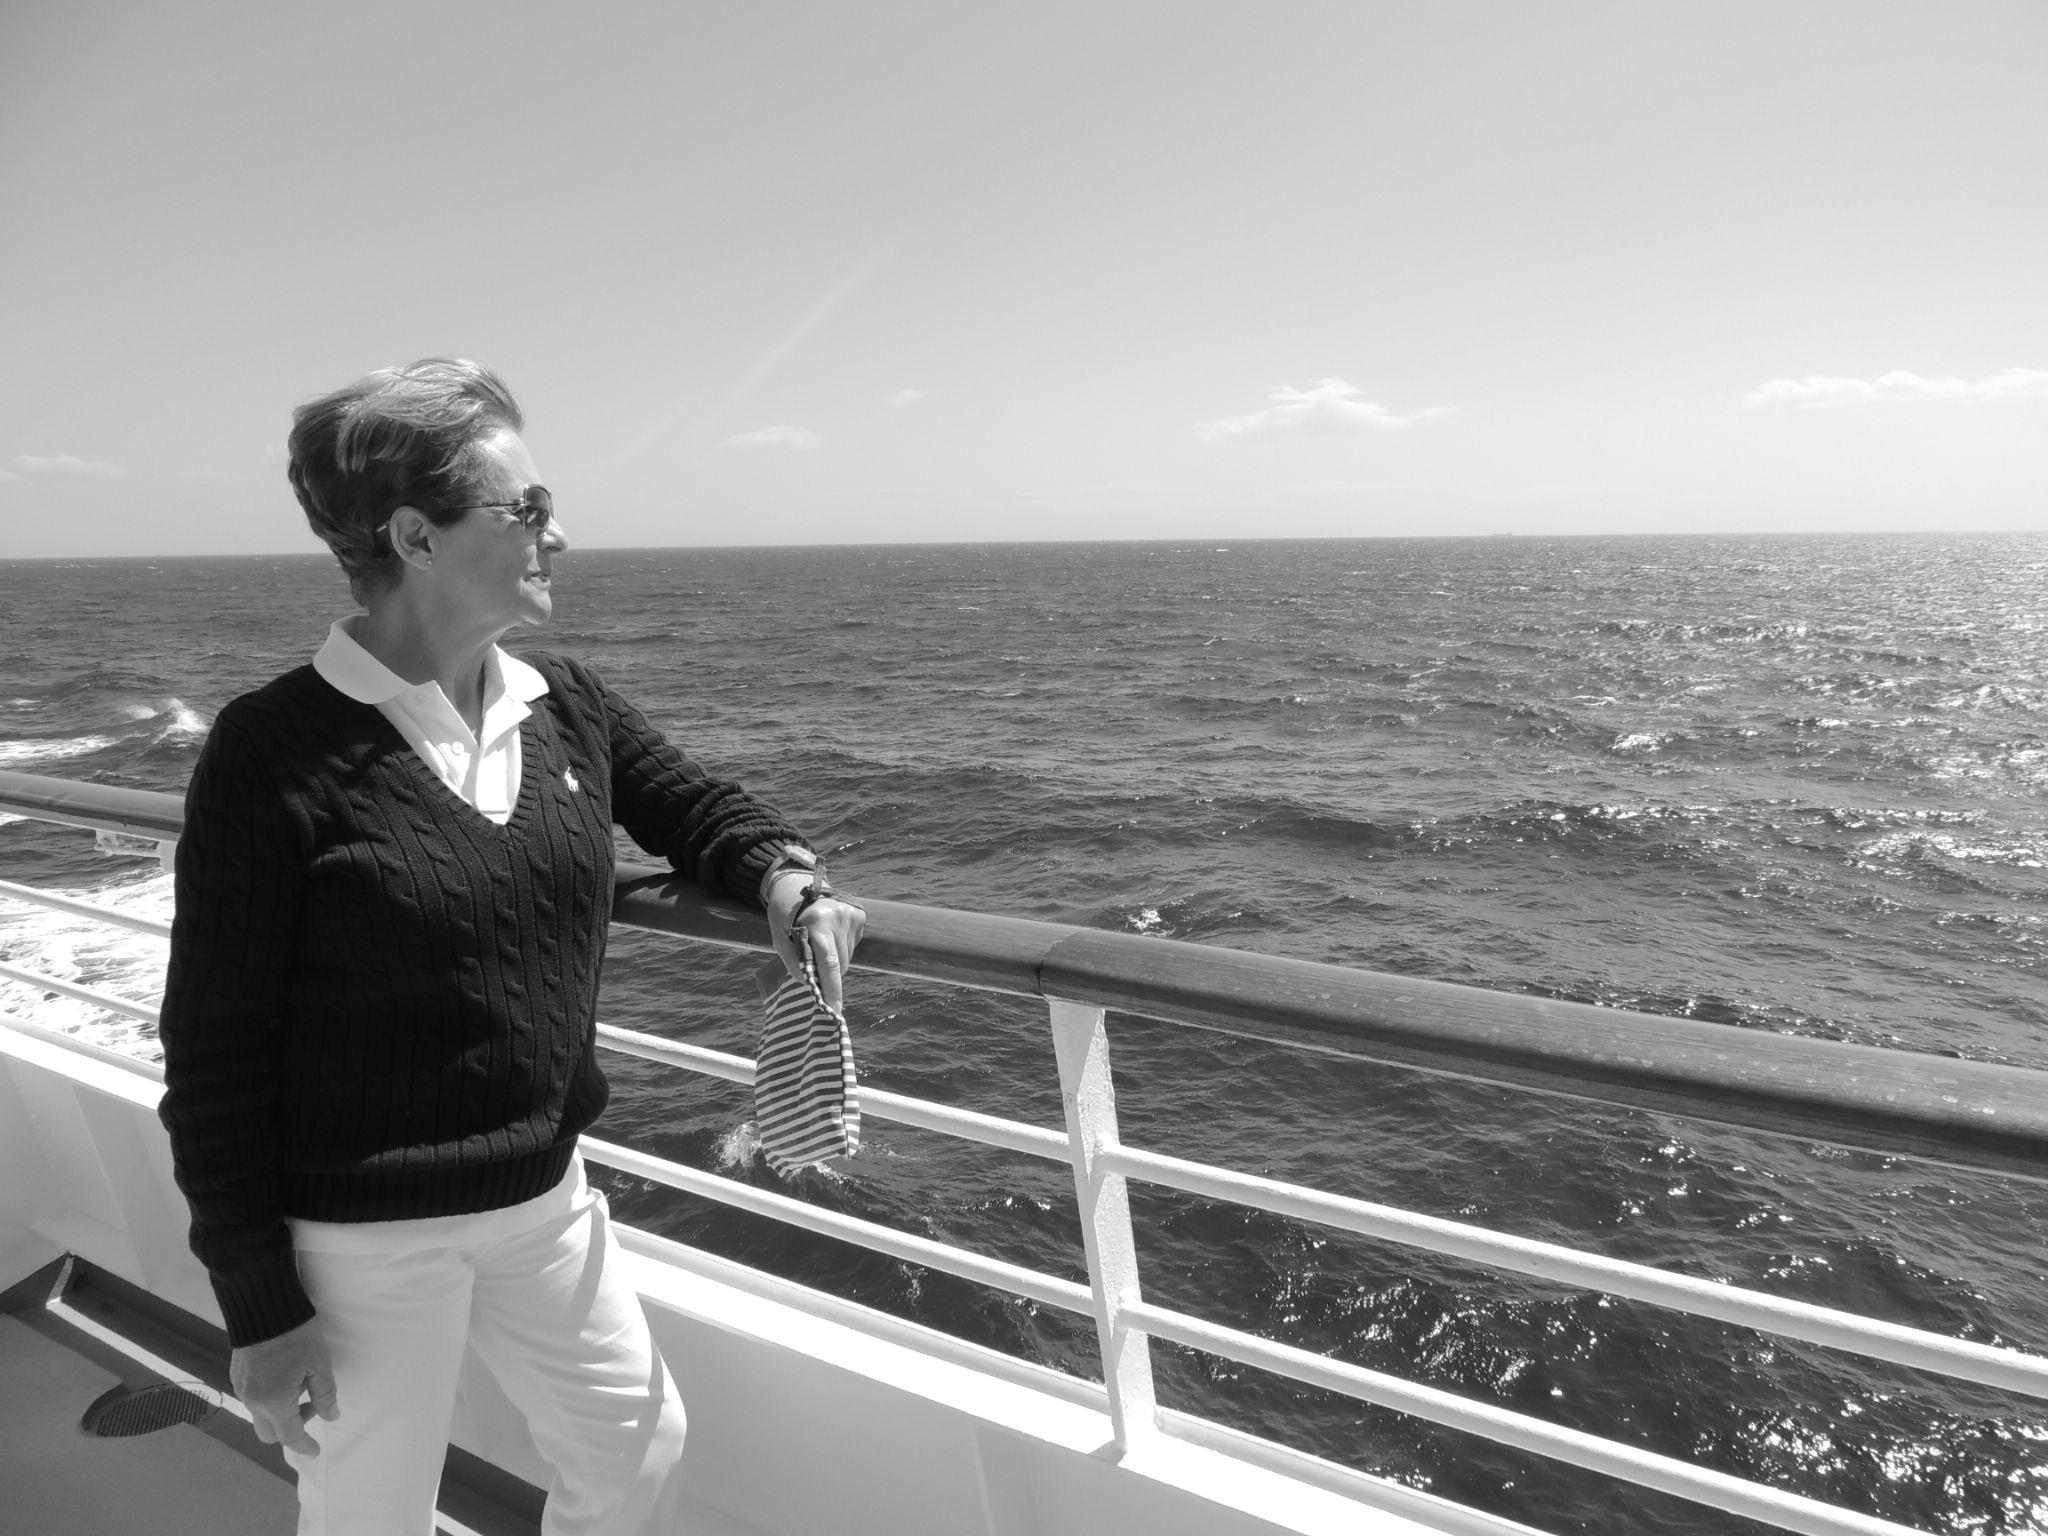 queen of the seas by efrain.tello.37